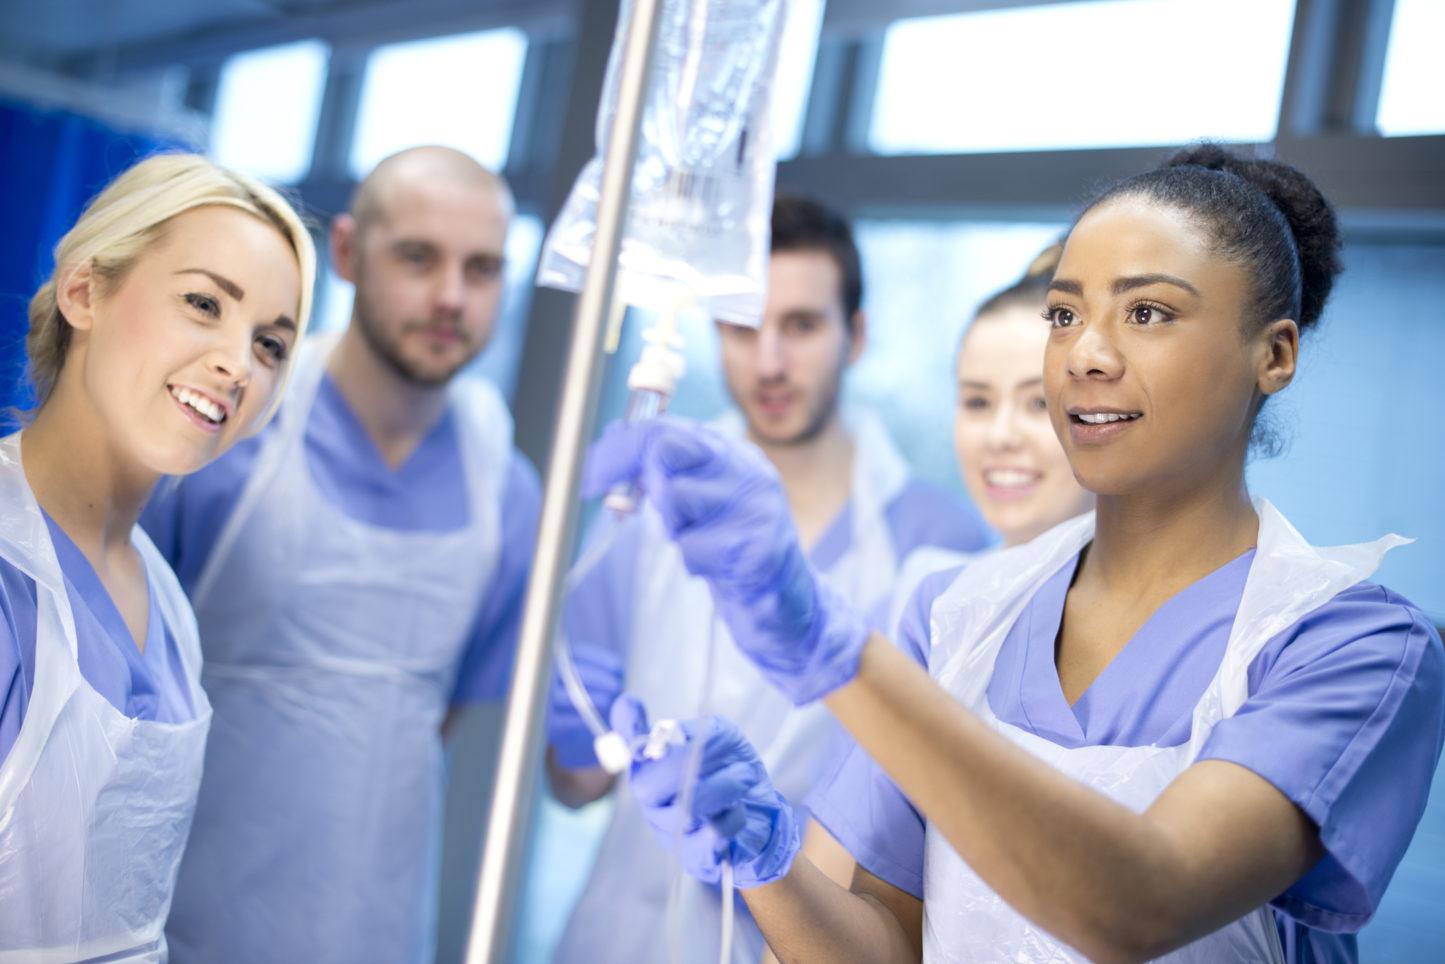 Team of nurses training on handling medical IV equipment